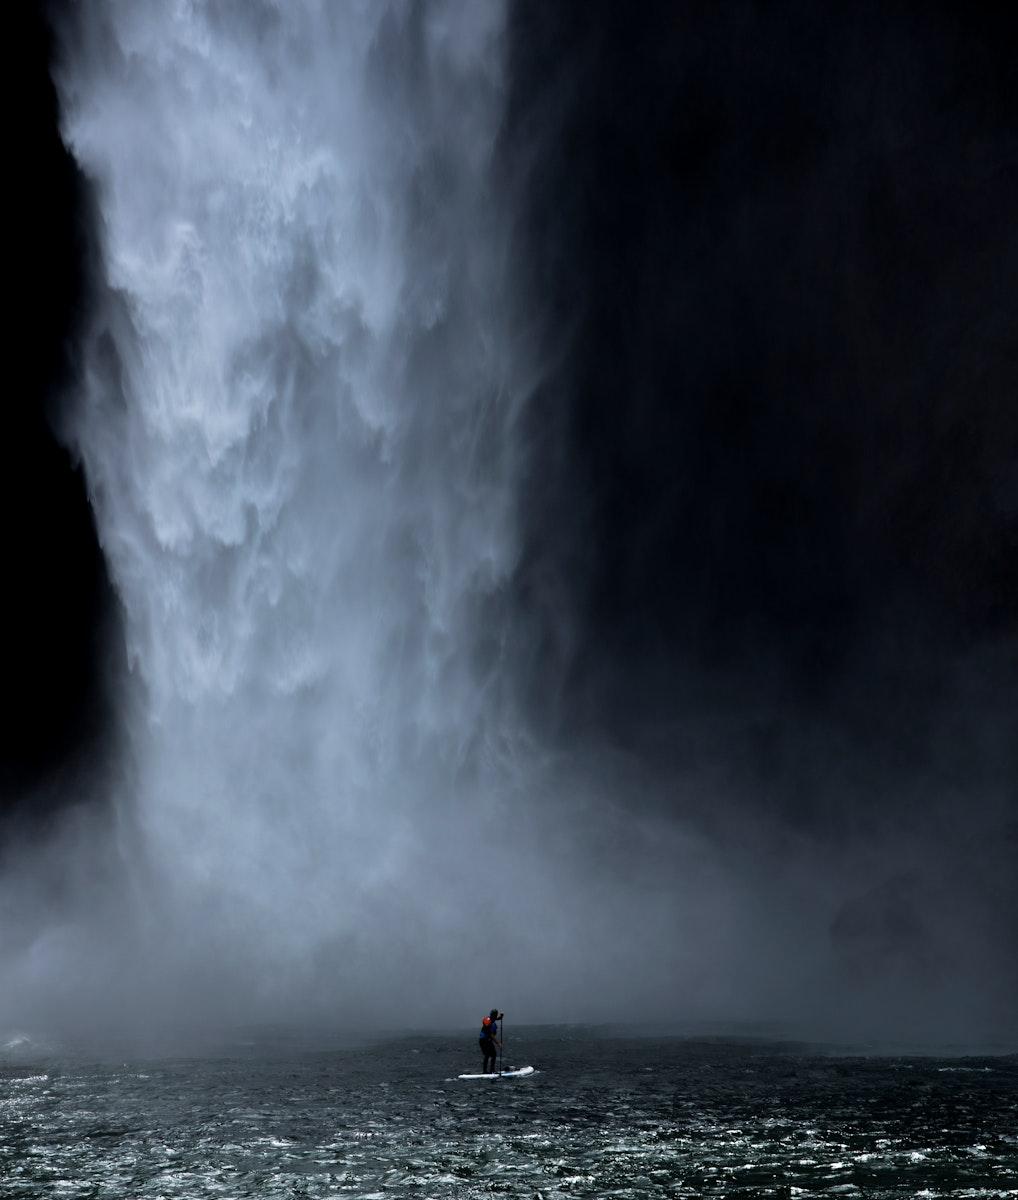 Beautiful view of Snoqualmie Falls in Washington, USA